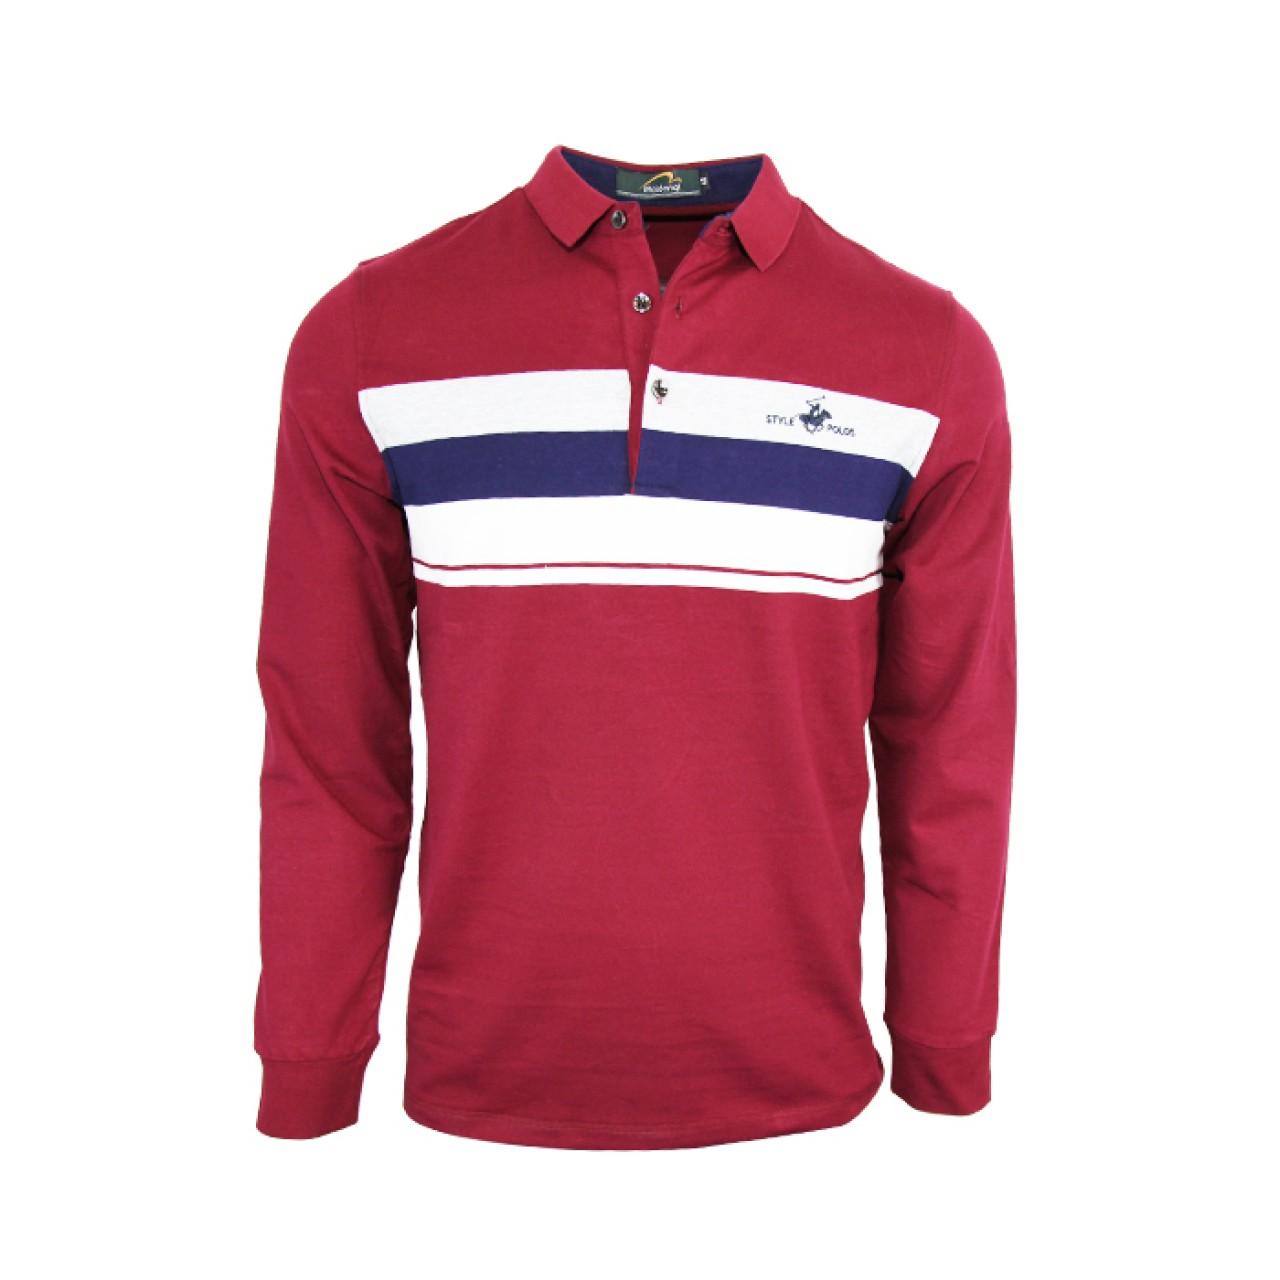 Maroon Full Sleeve Polo Shirt